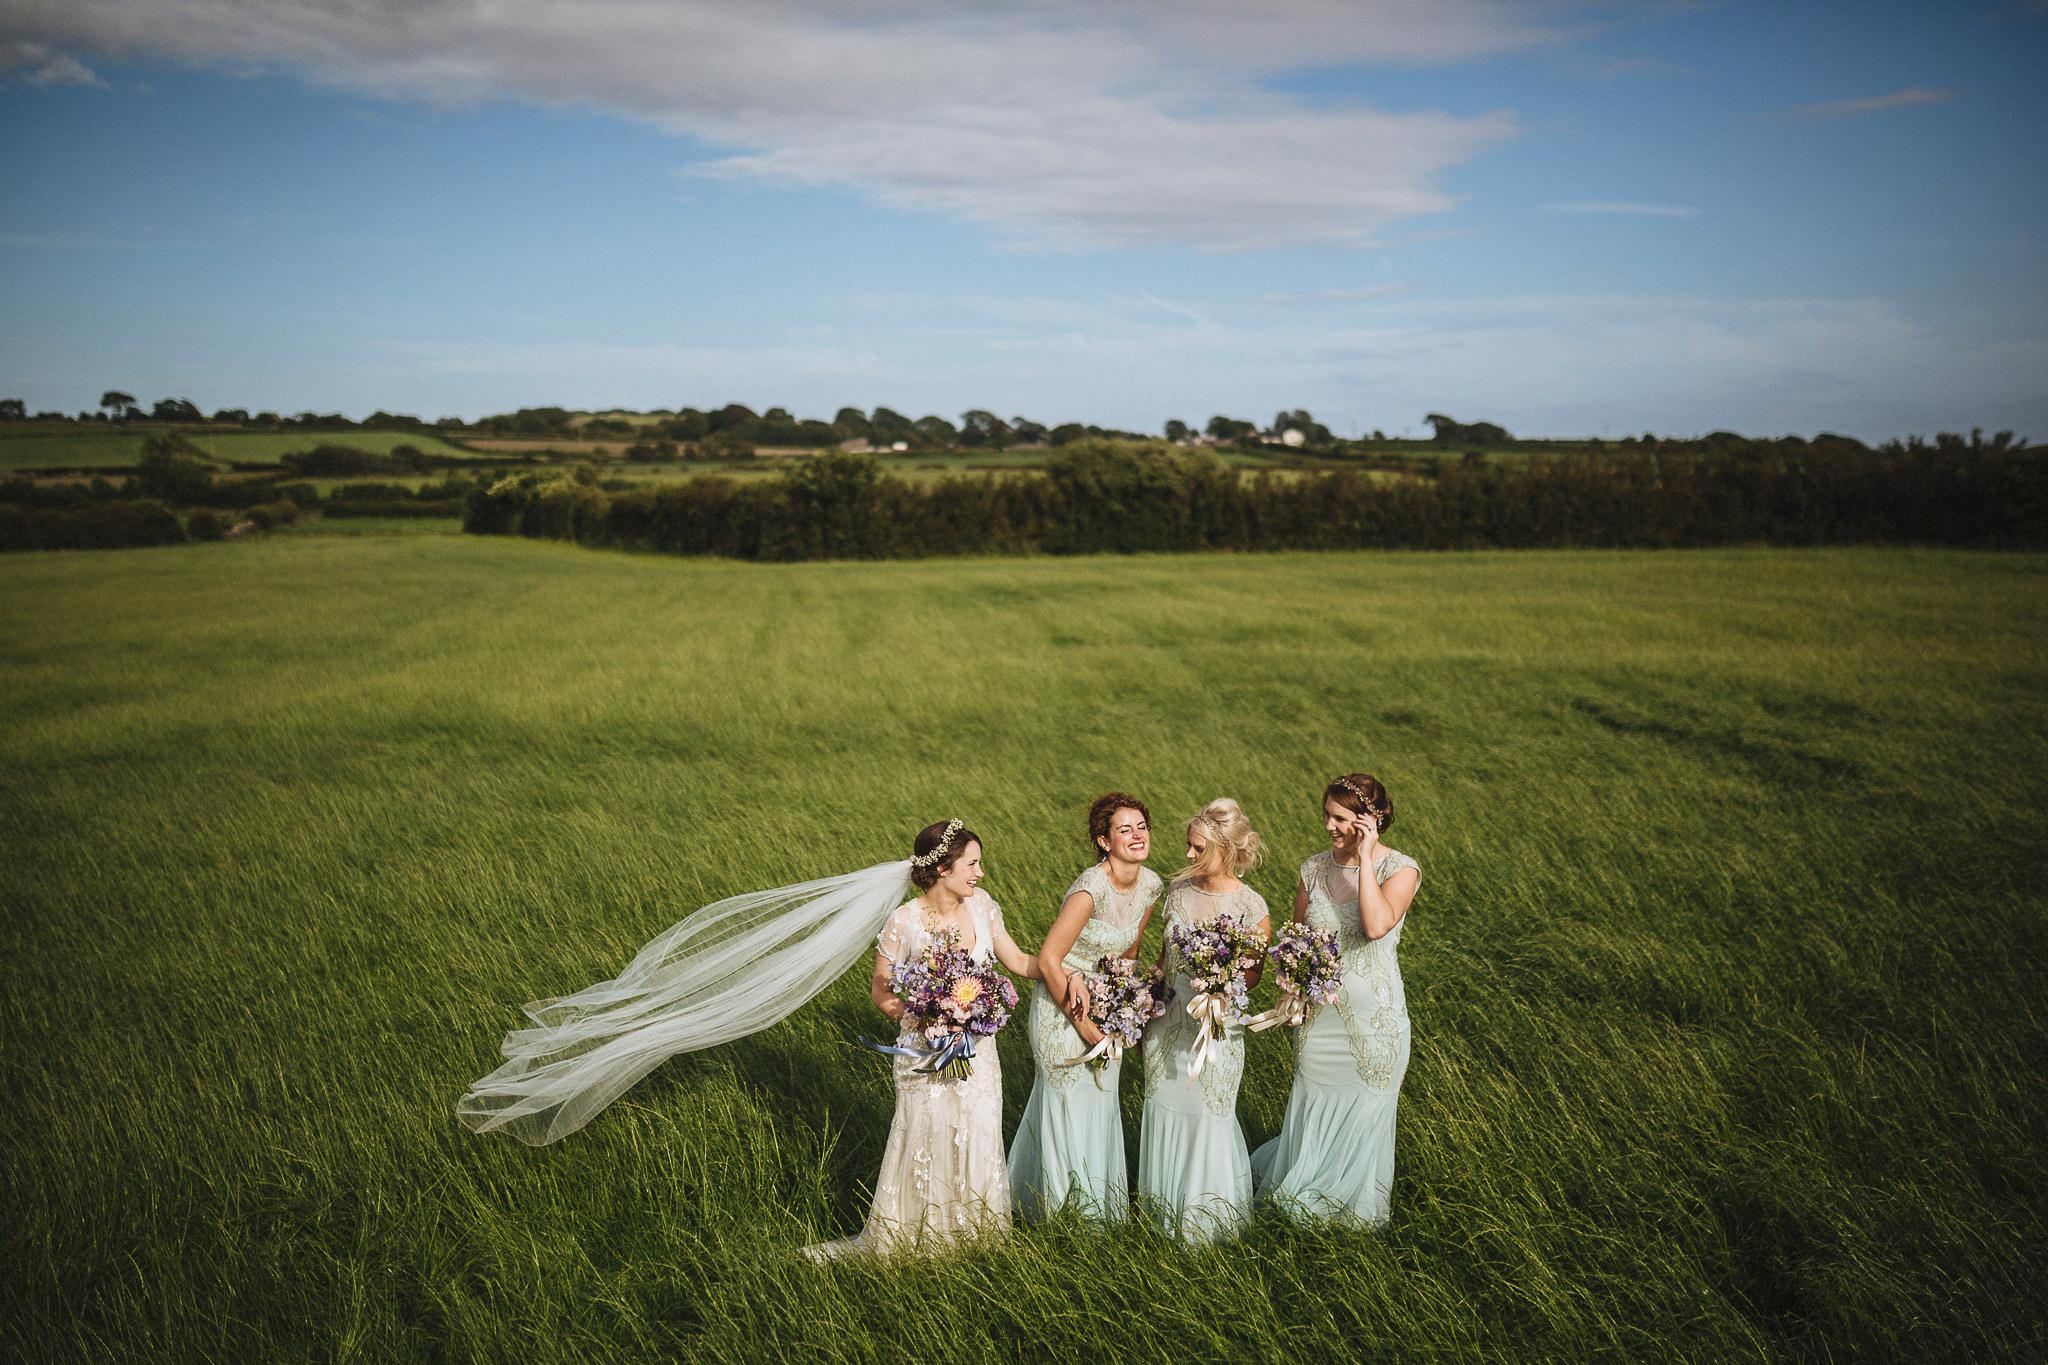 paul-marbrook-Farm-Wedding-Photographer-Lancashire-90063